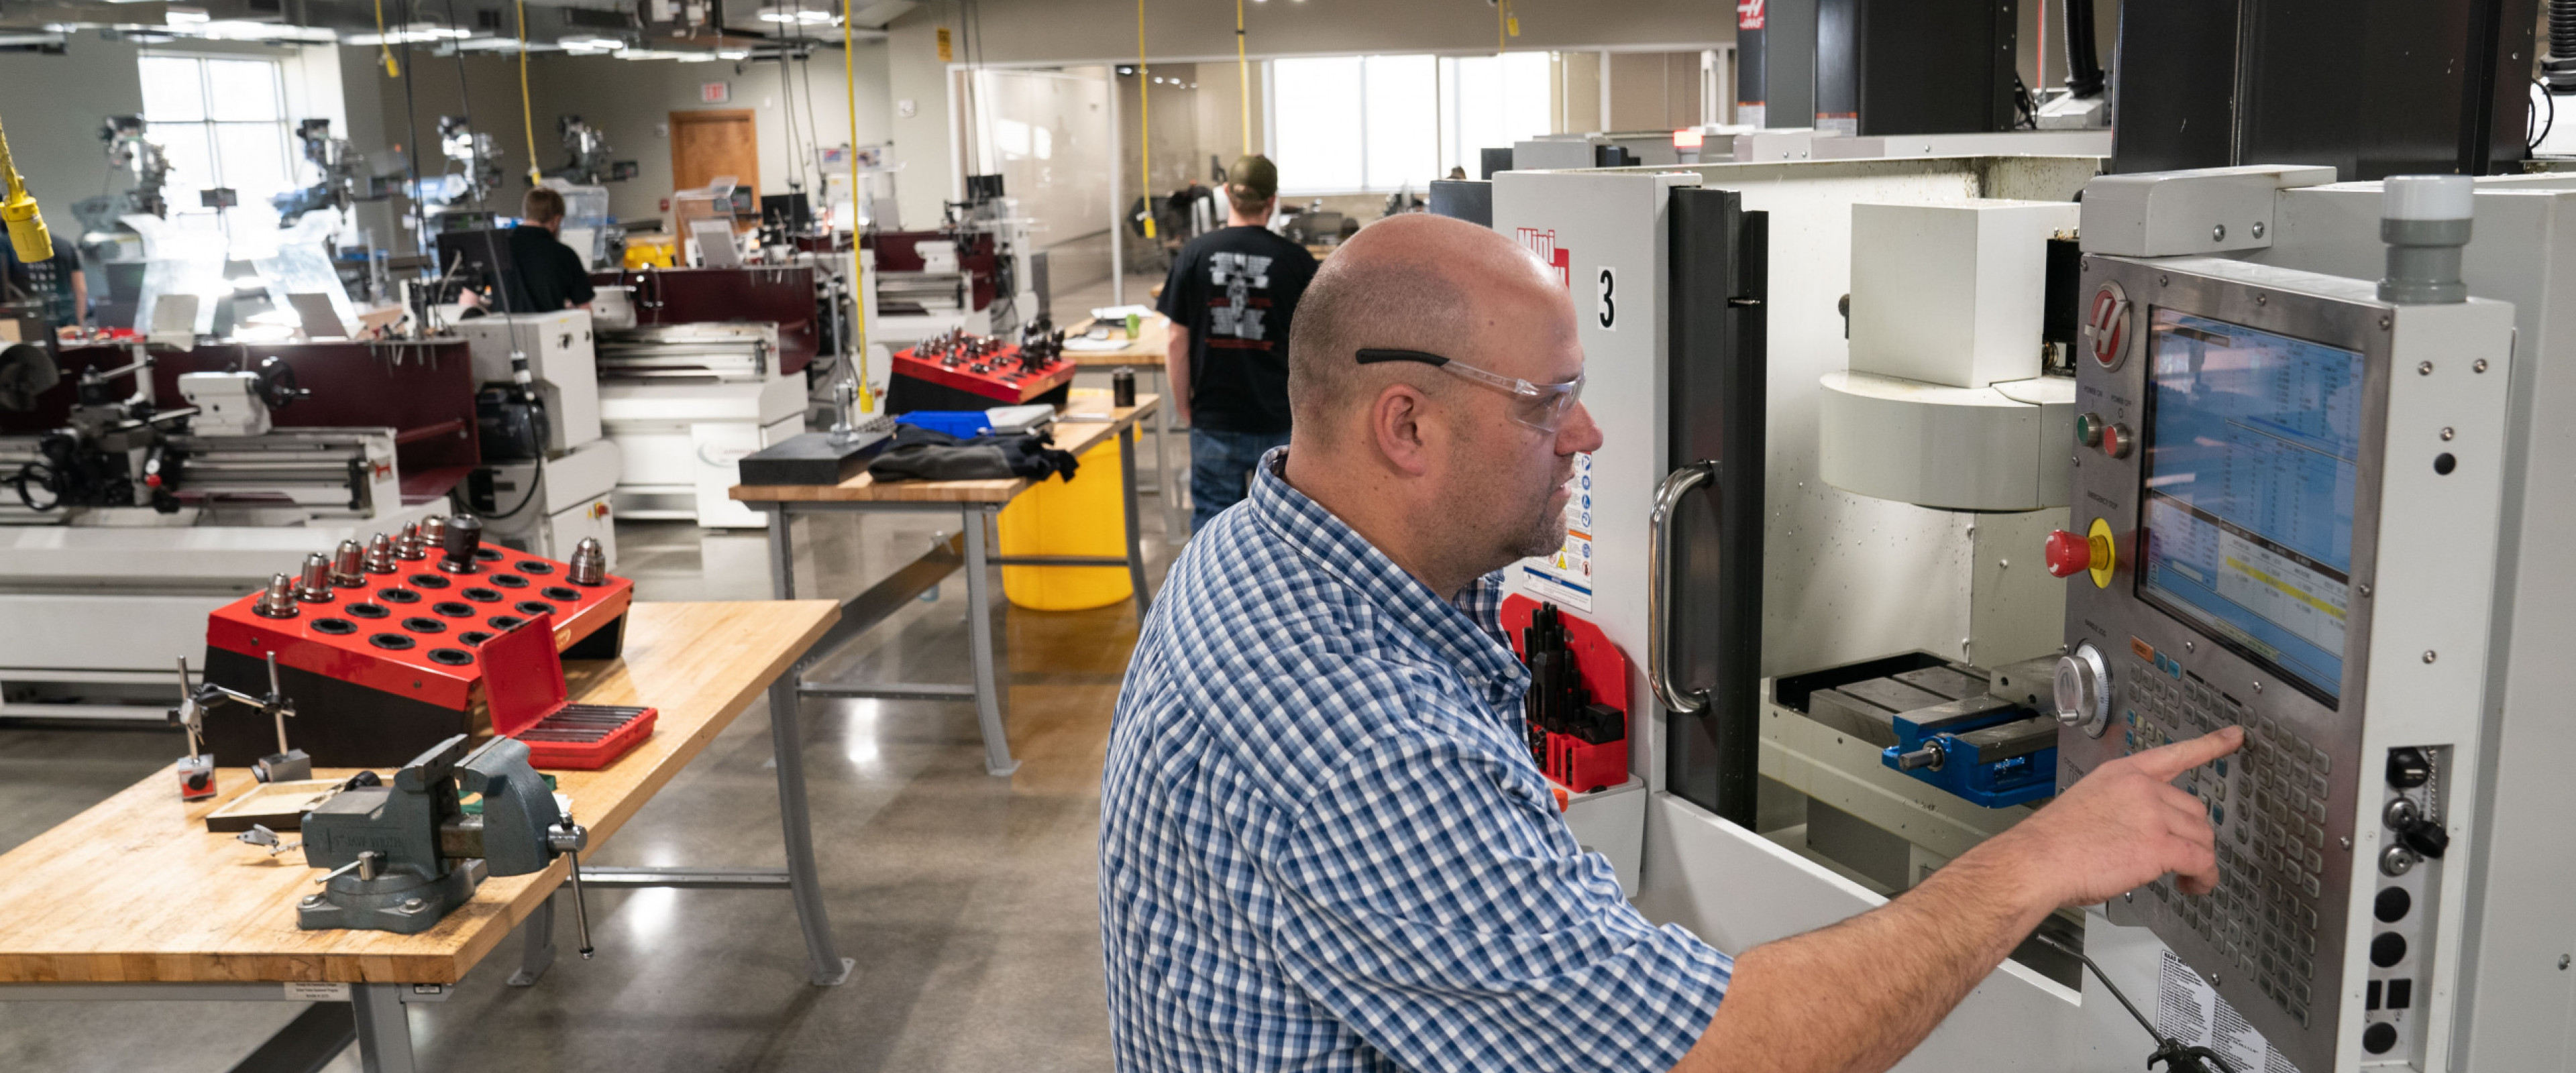 Man using equipment at AMP Lab @ WMU